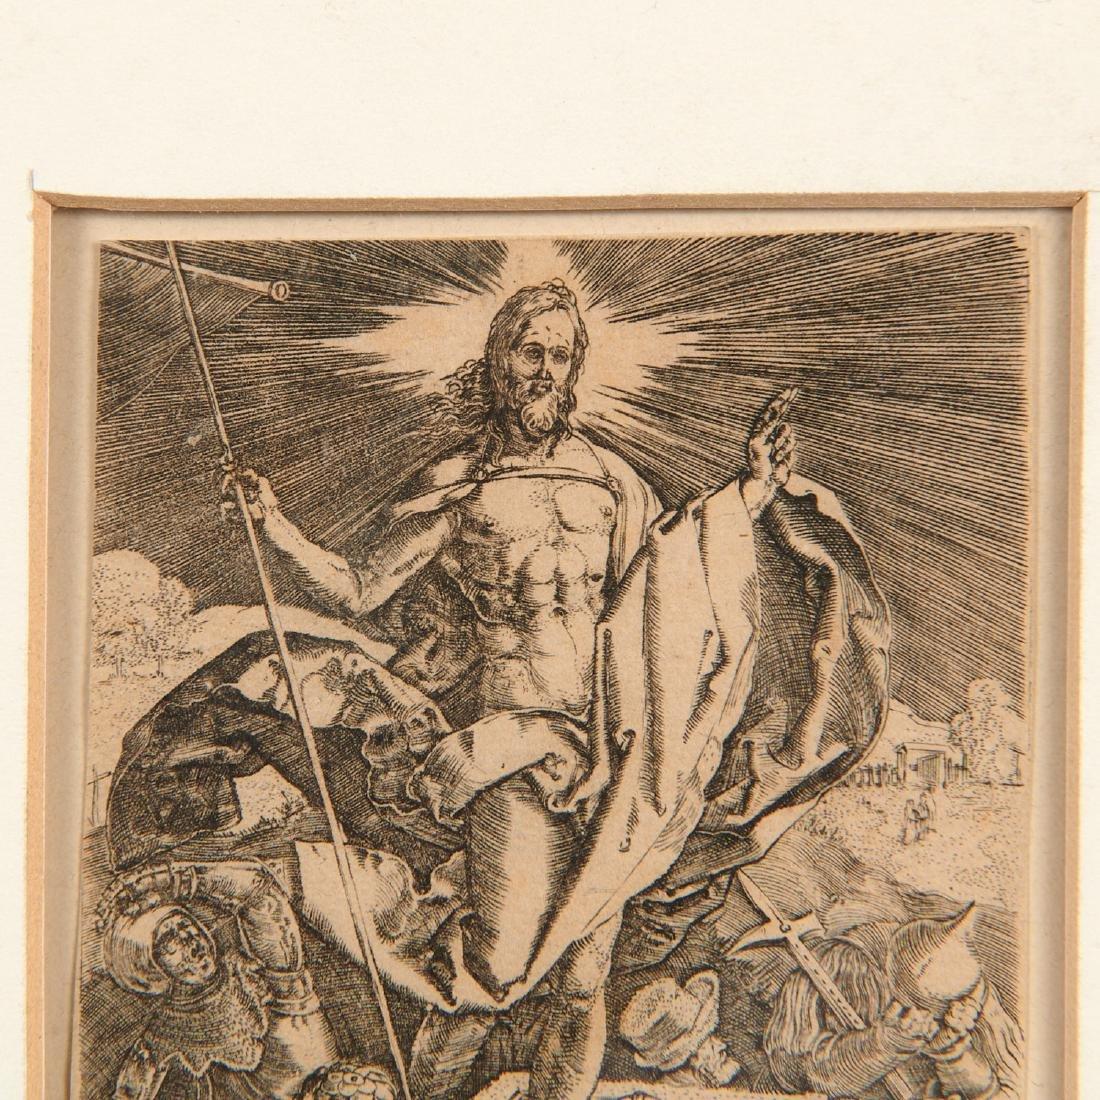 Albrecht Durer, engraving - 3